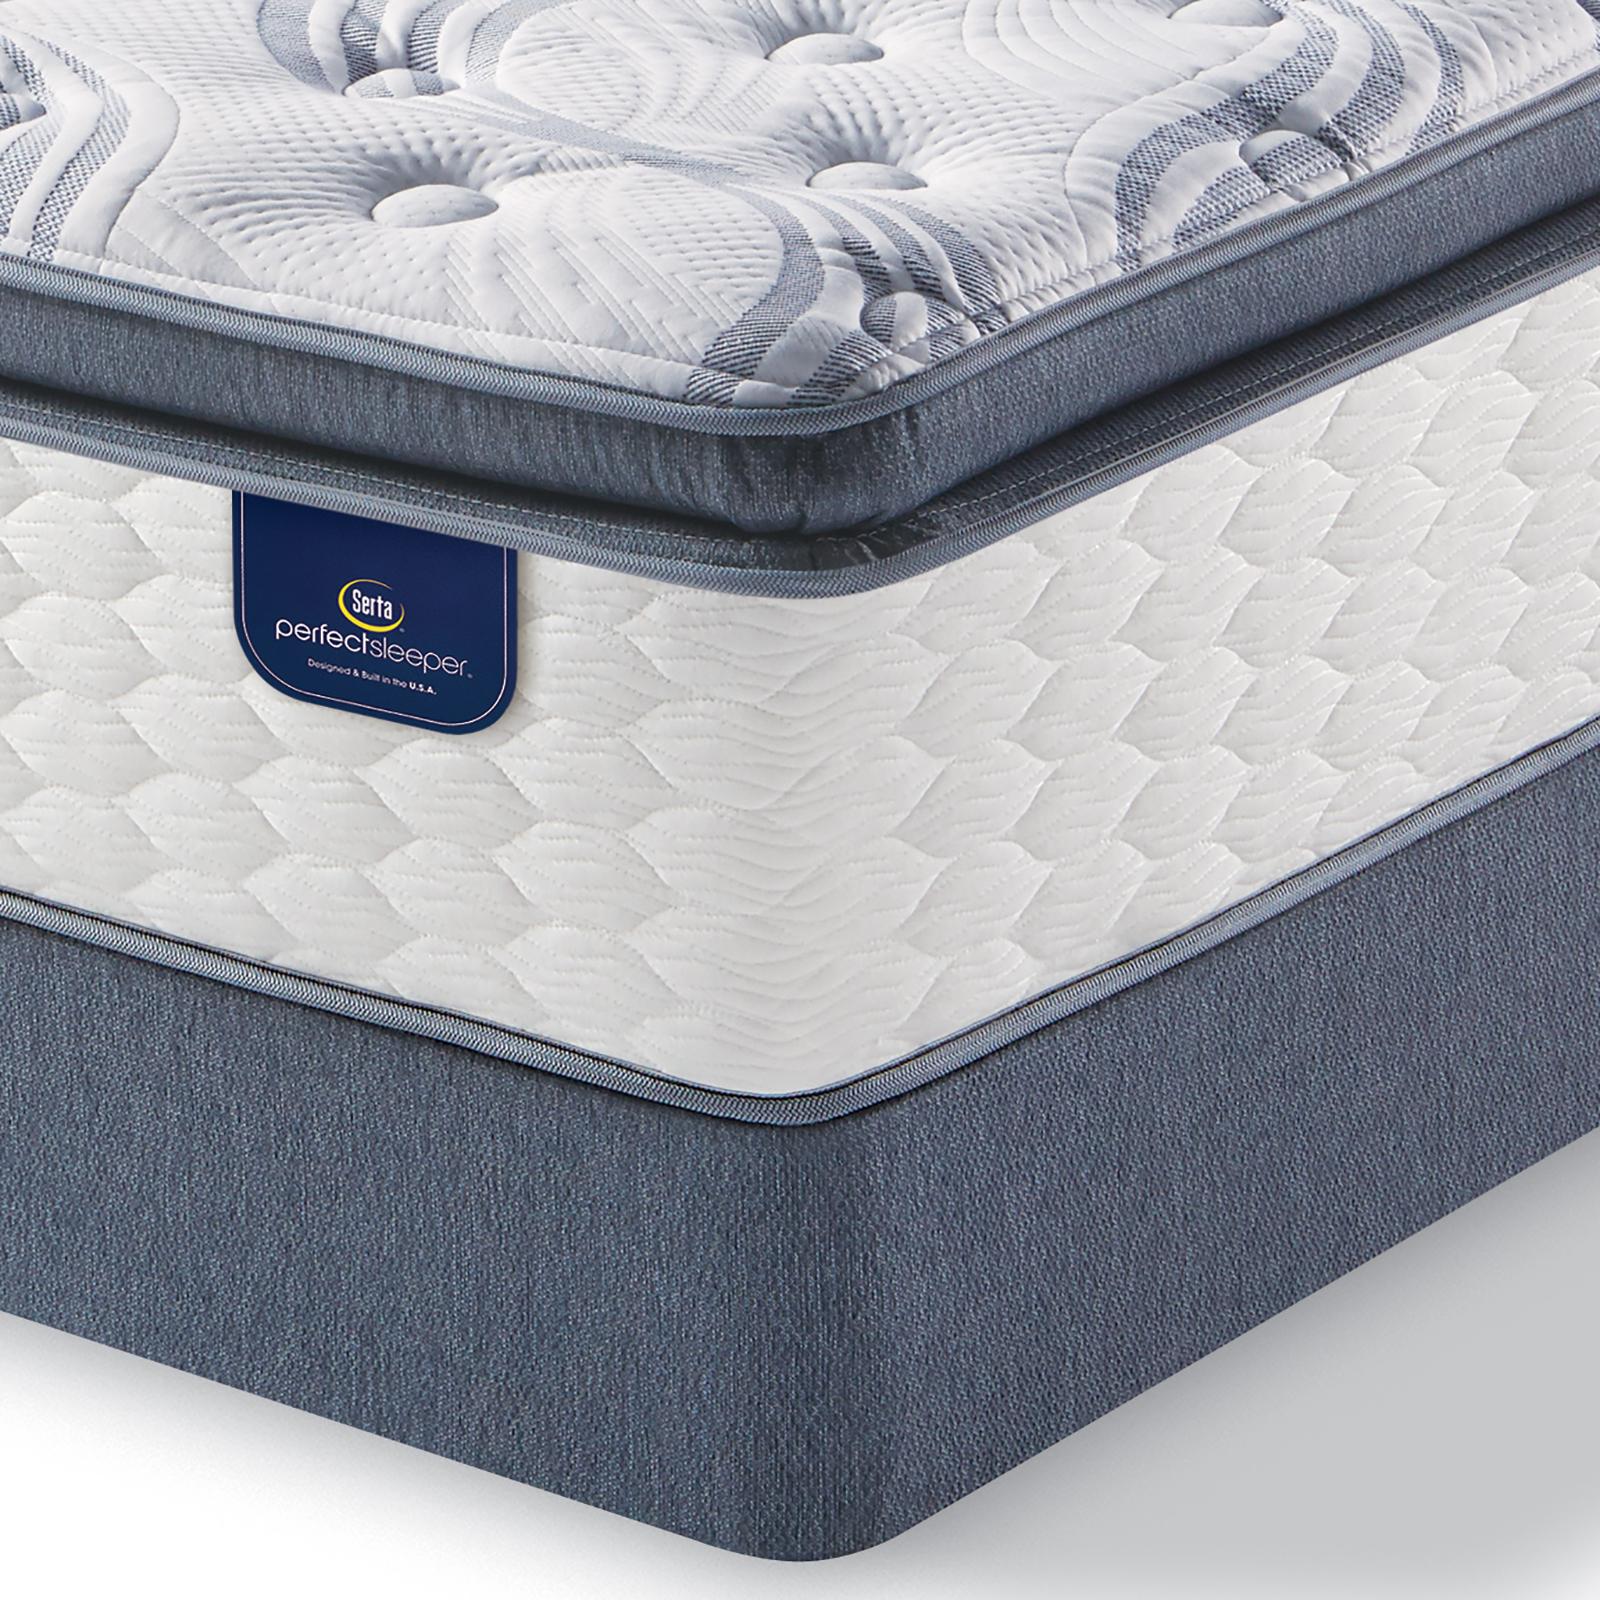 Serta Perfect Sleeper Teddington Plush Queen Mattress